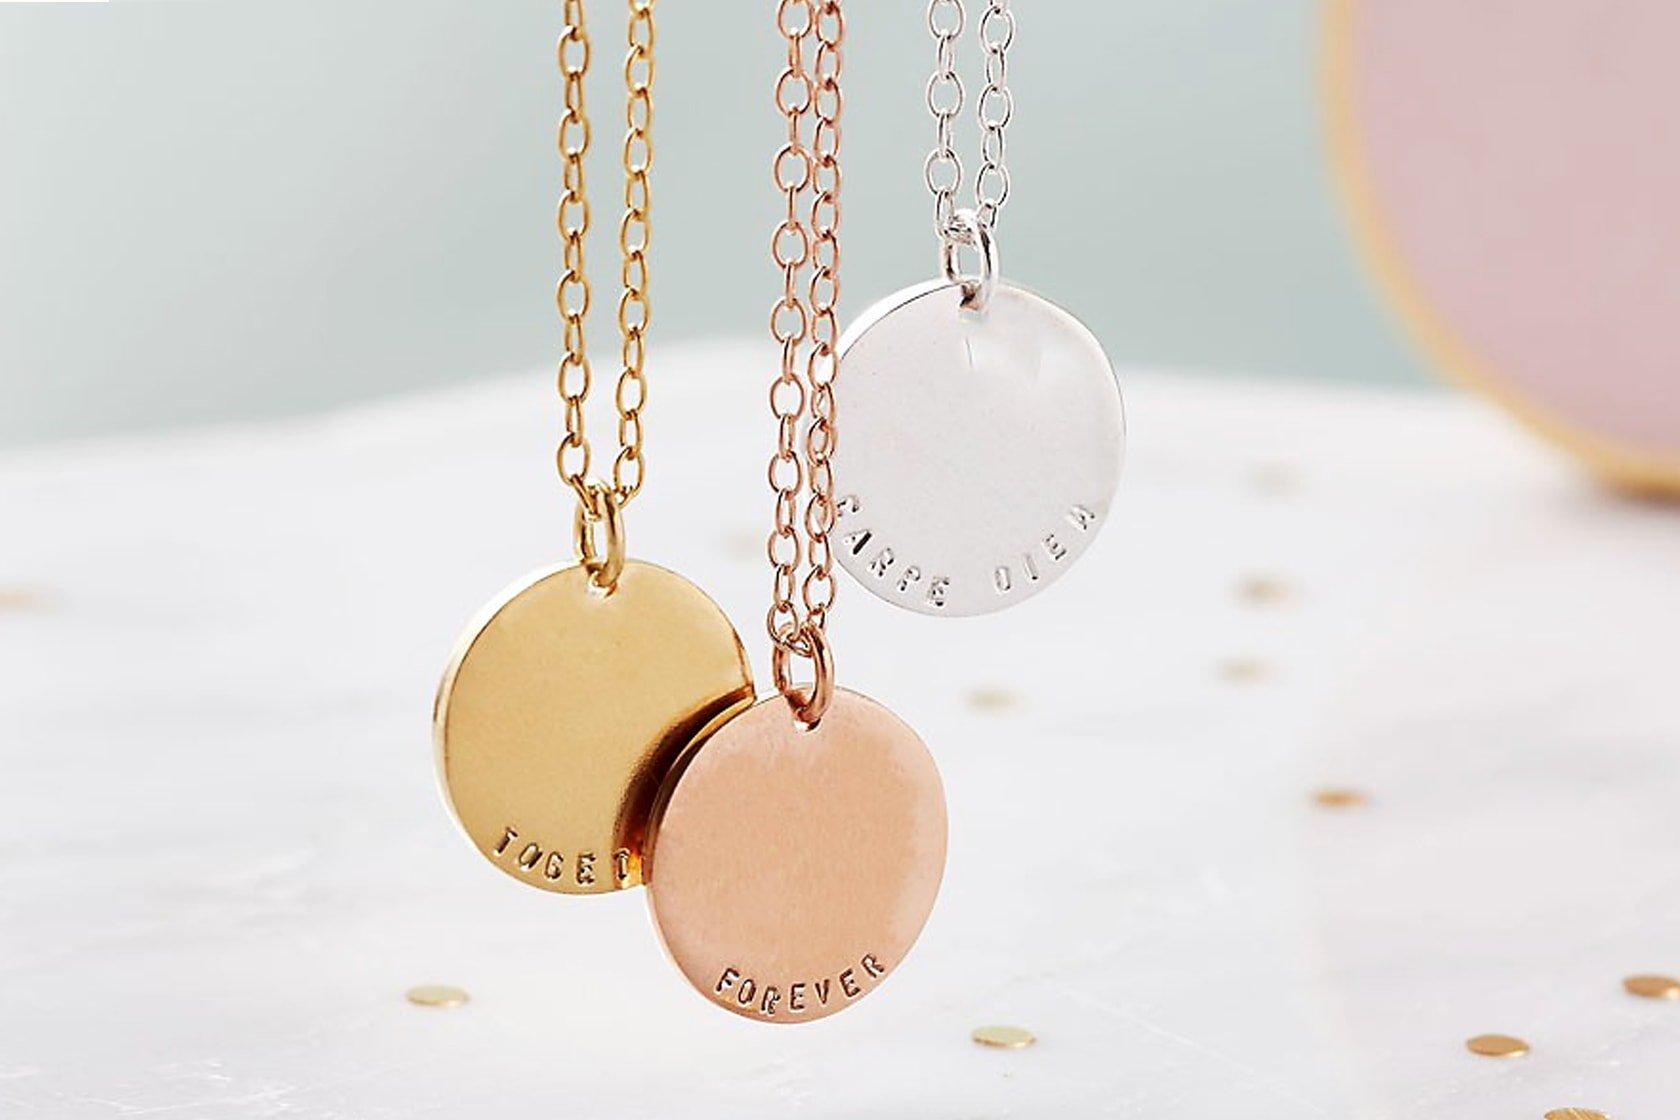 Women's Jewellery Under £100